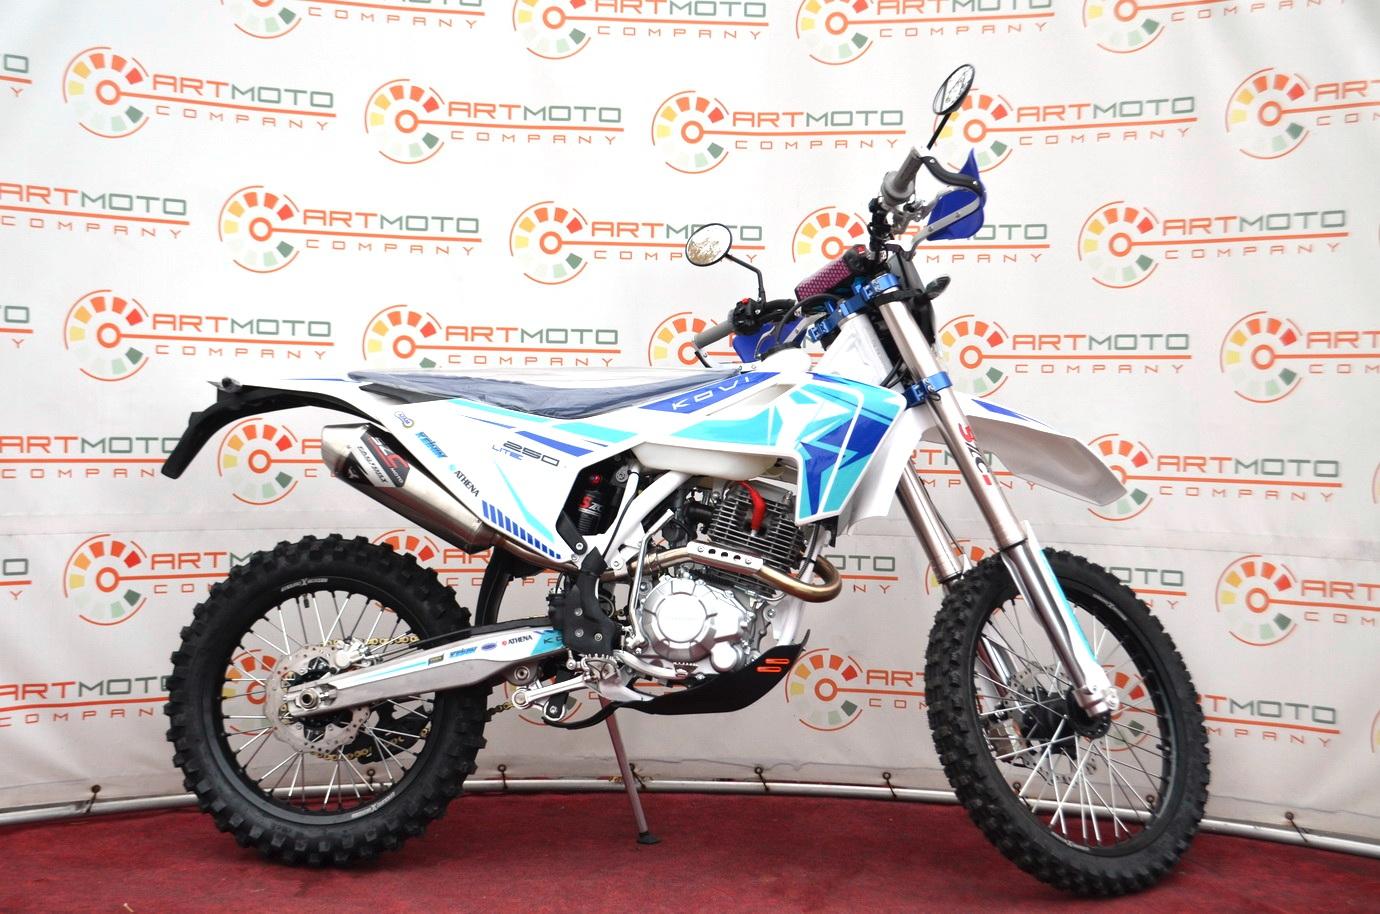 МОТОЦИКЛ KOVI 250 LITE 4T HUS  Артмото - купить квадроцикл в украине и харькове, мотоцикл, снегоход, скутер, мопед, электромобиль